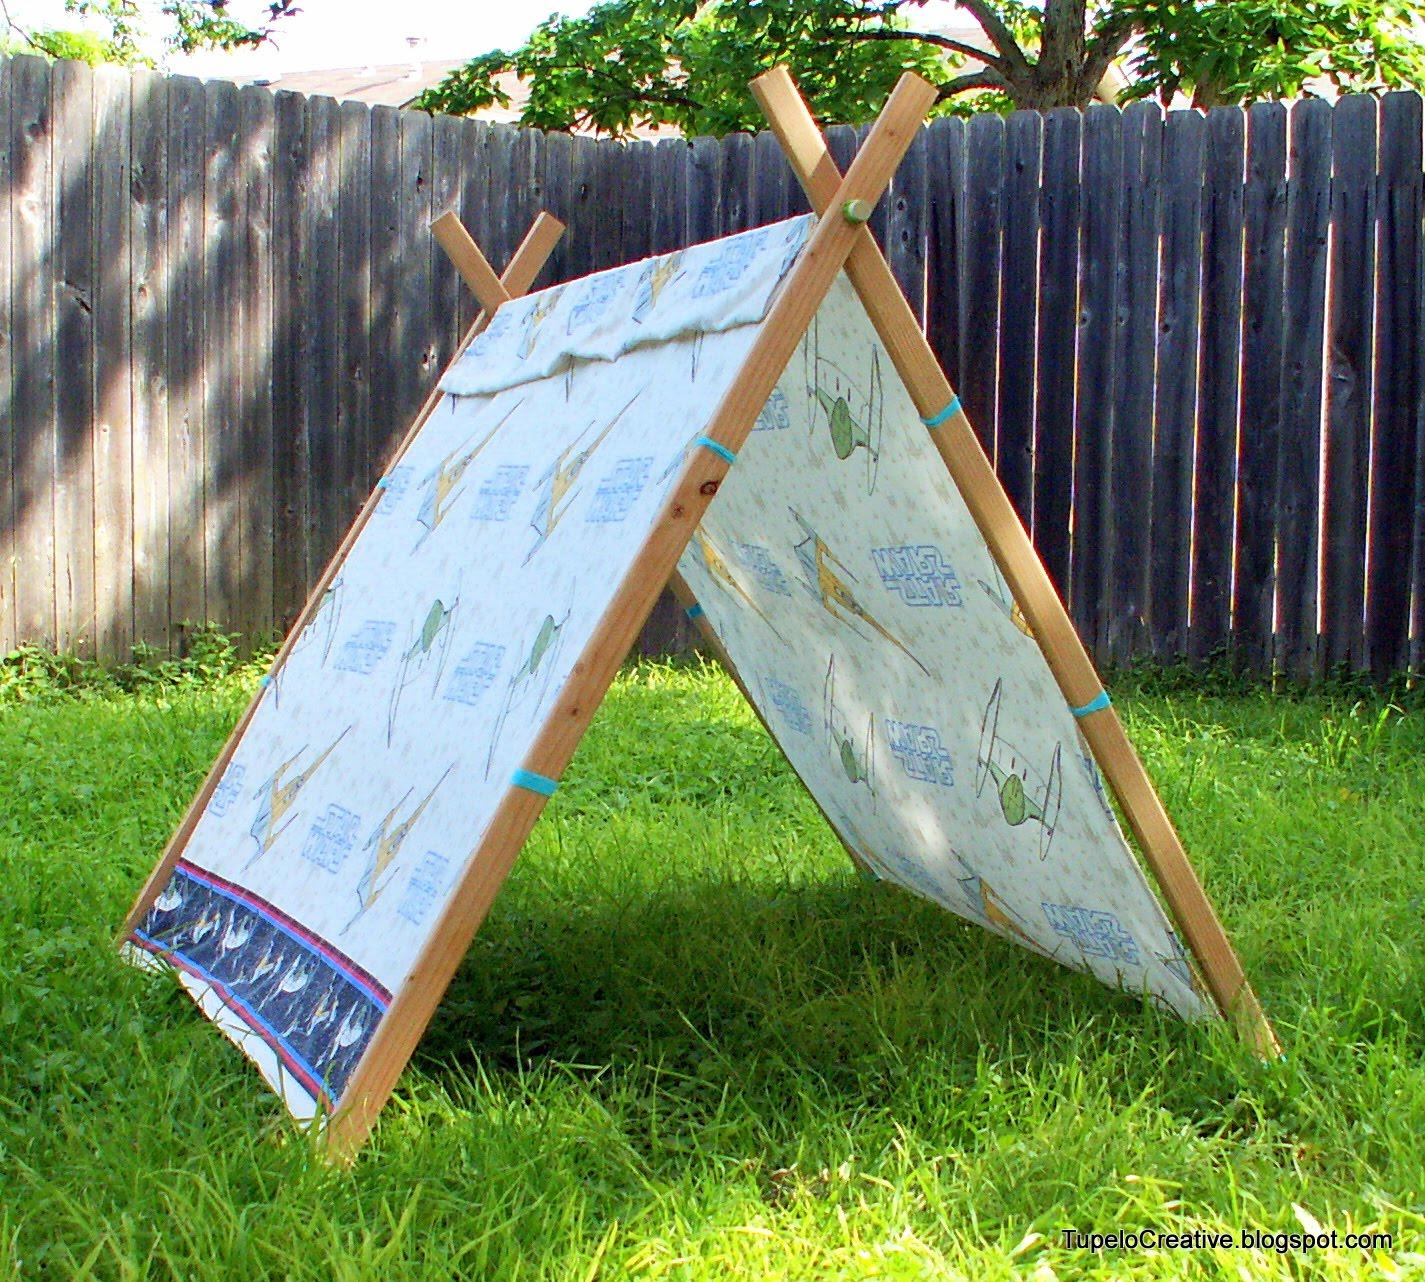 Tupelo Creative: DIY Simple Kid's Tent